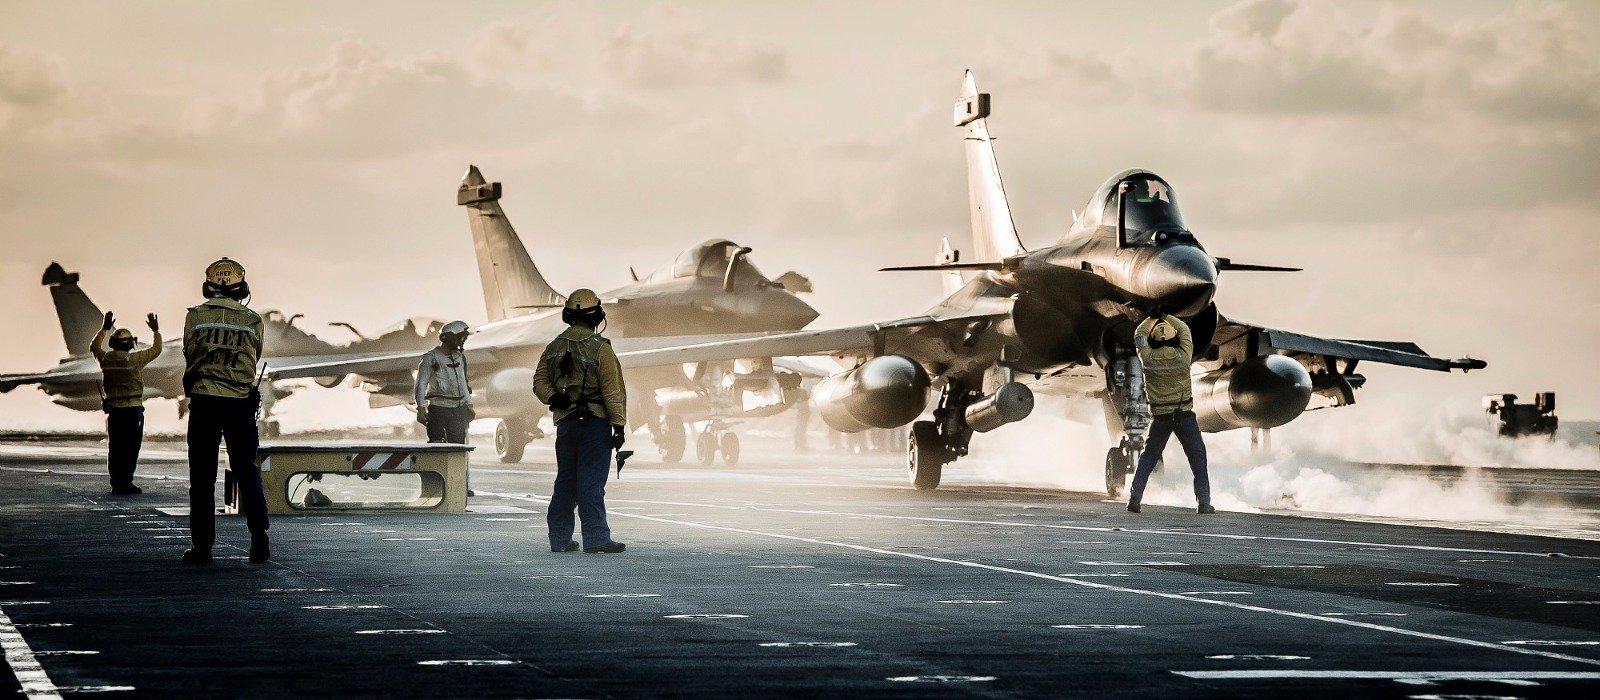 The Rafale, the latest Dassault Aviation combat aircraft ...